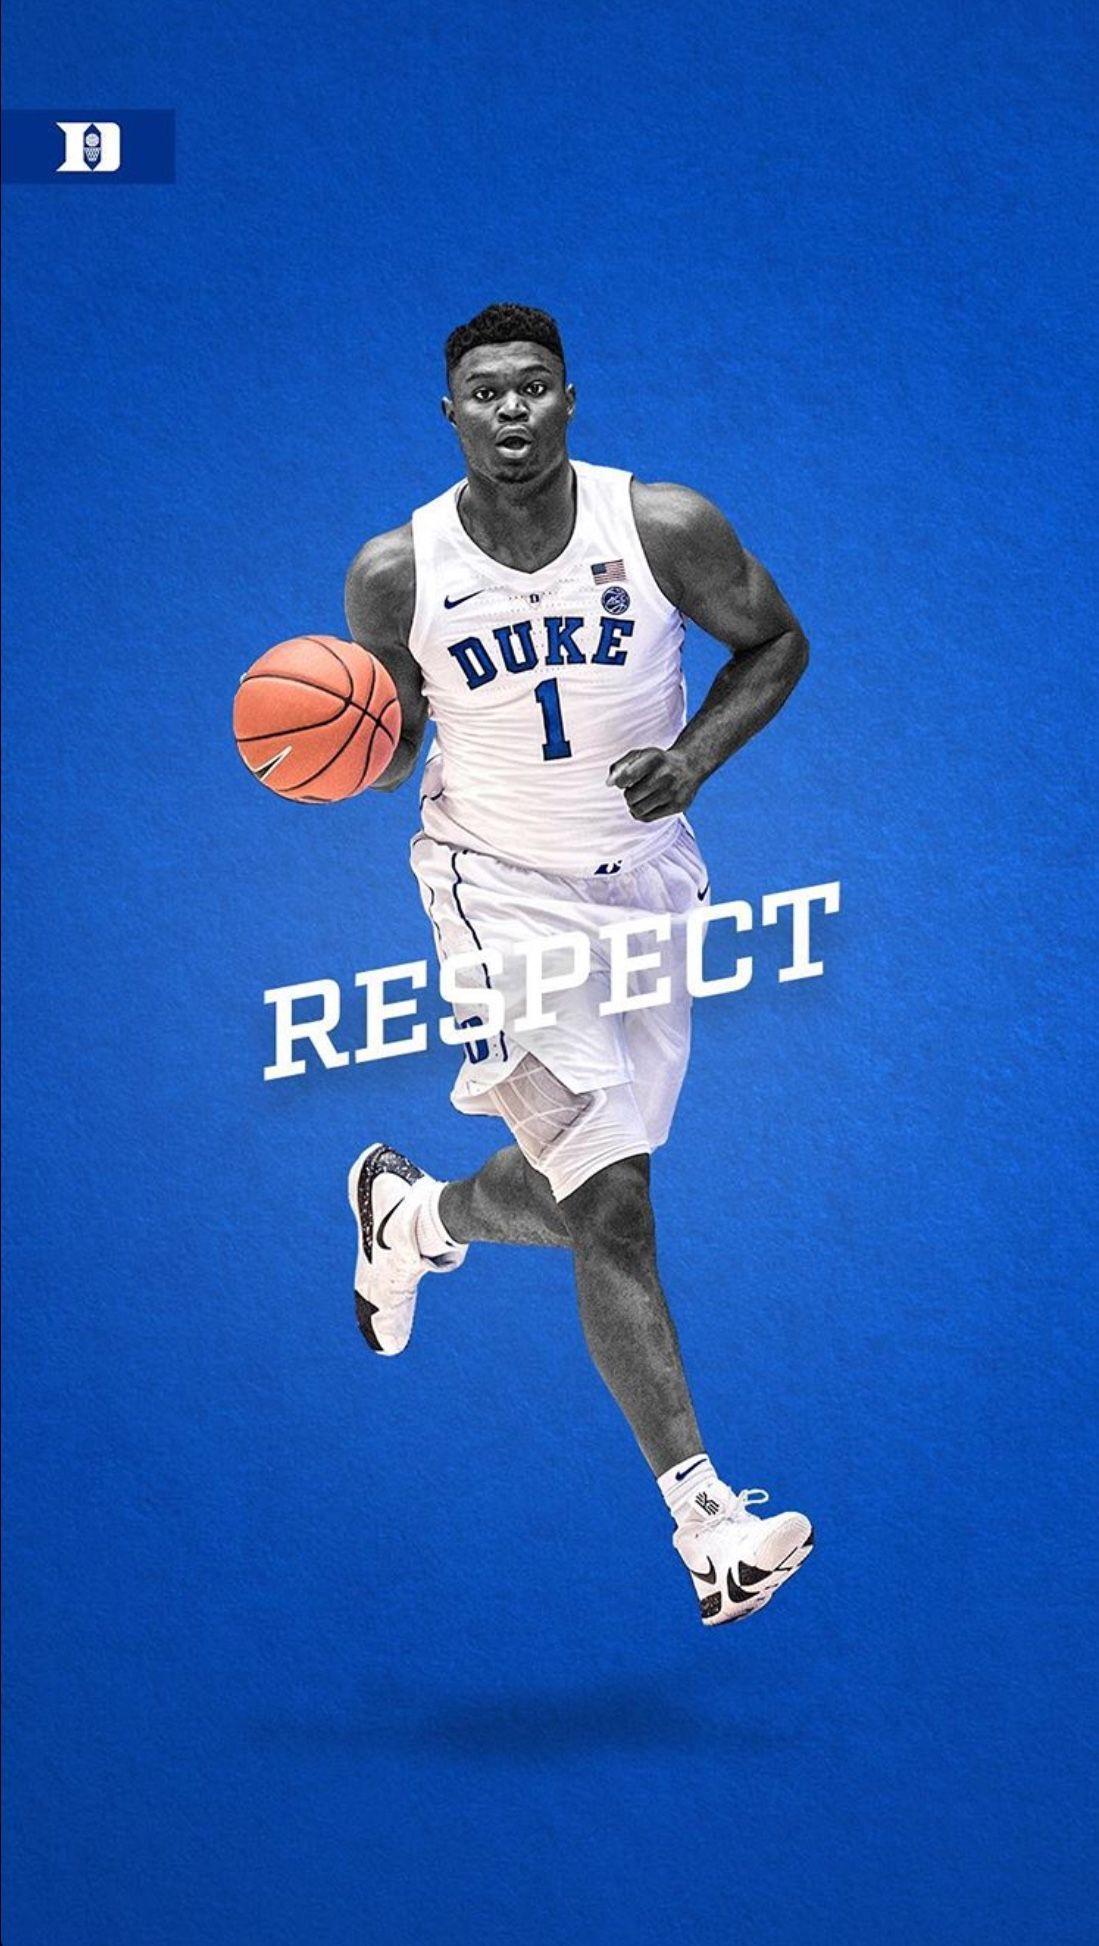 Zion Williamson Wallpaper Zion Williamson Wallpaper In 2020 Duke Blue Devils Basketball Duke Basketball Players Basketball Wallpaper